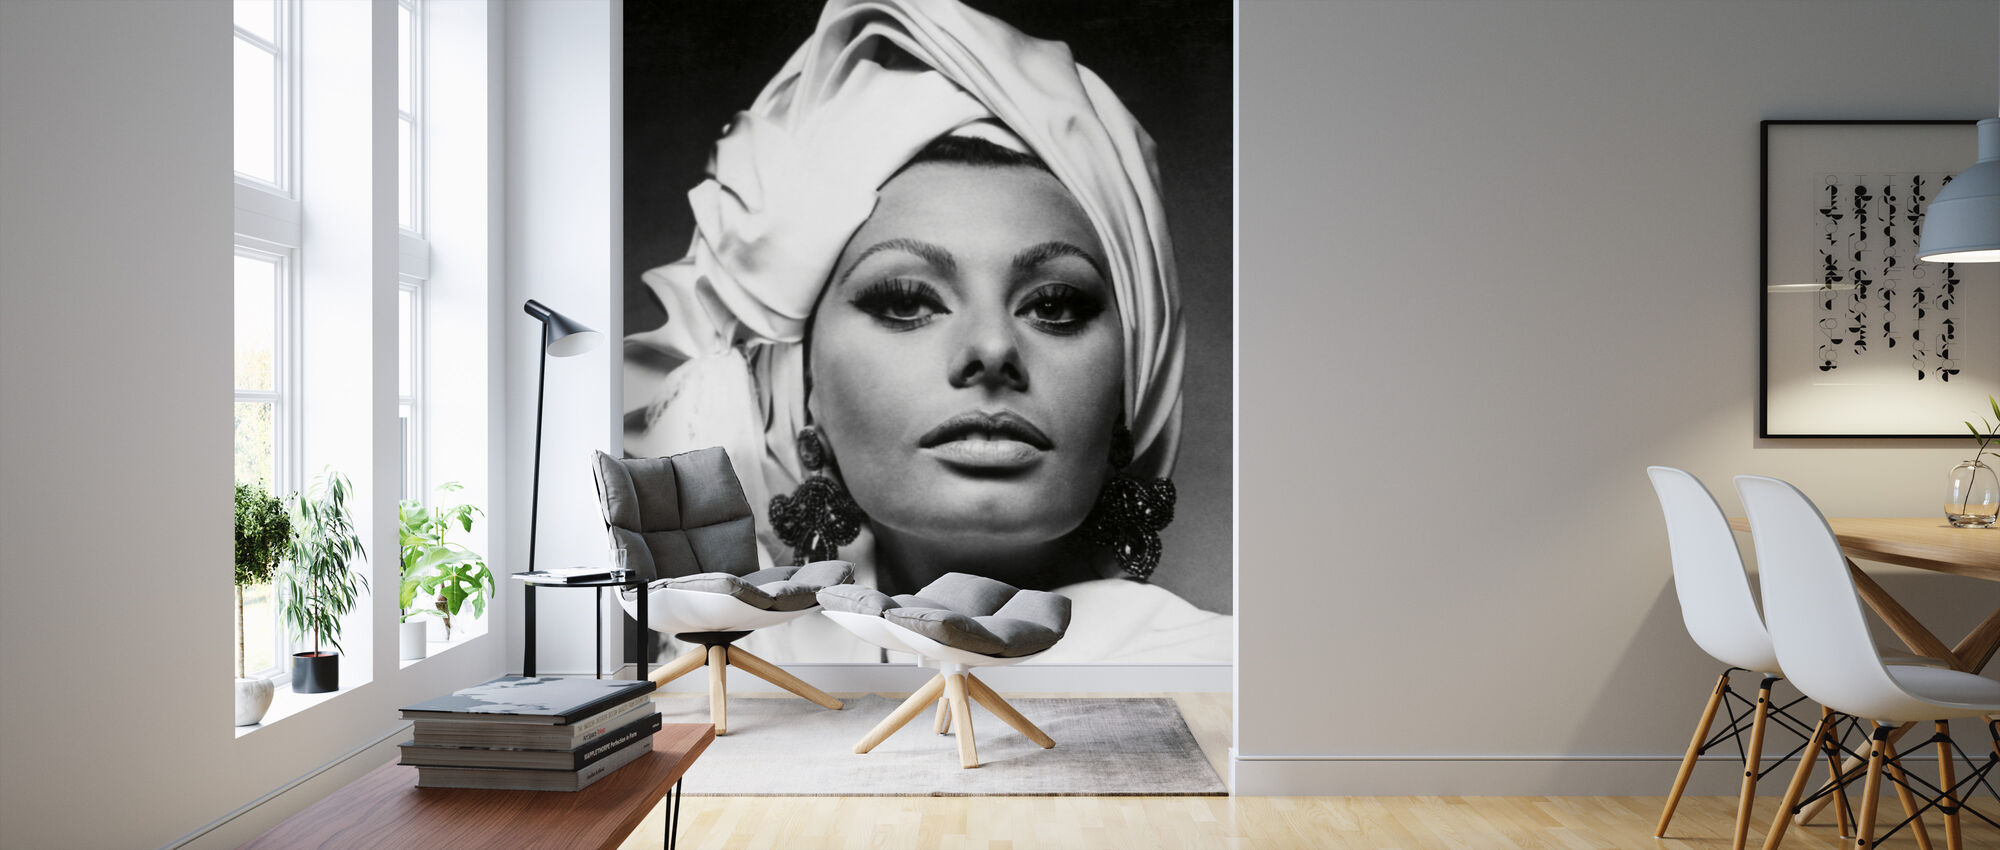 Arabesque - Sophia Loren - Behang - Woonkamer